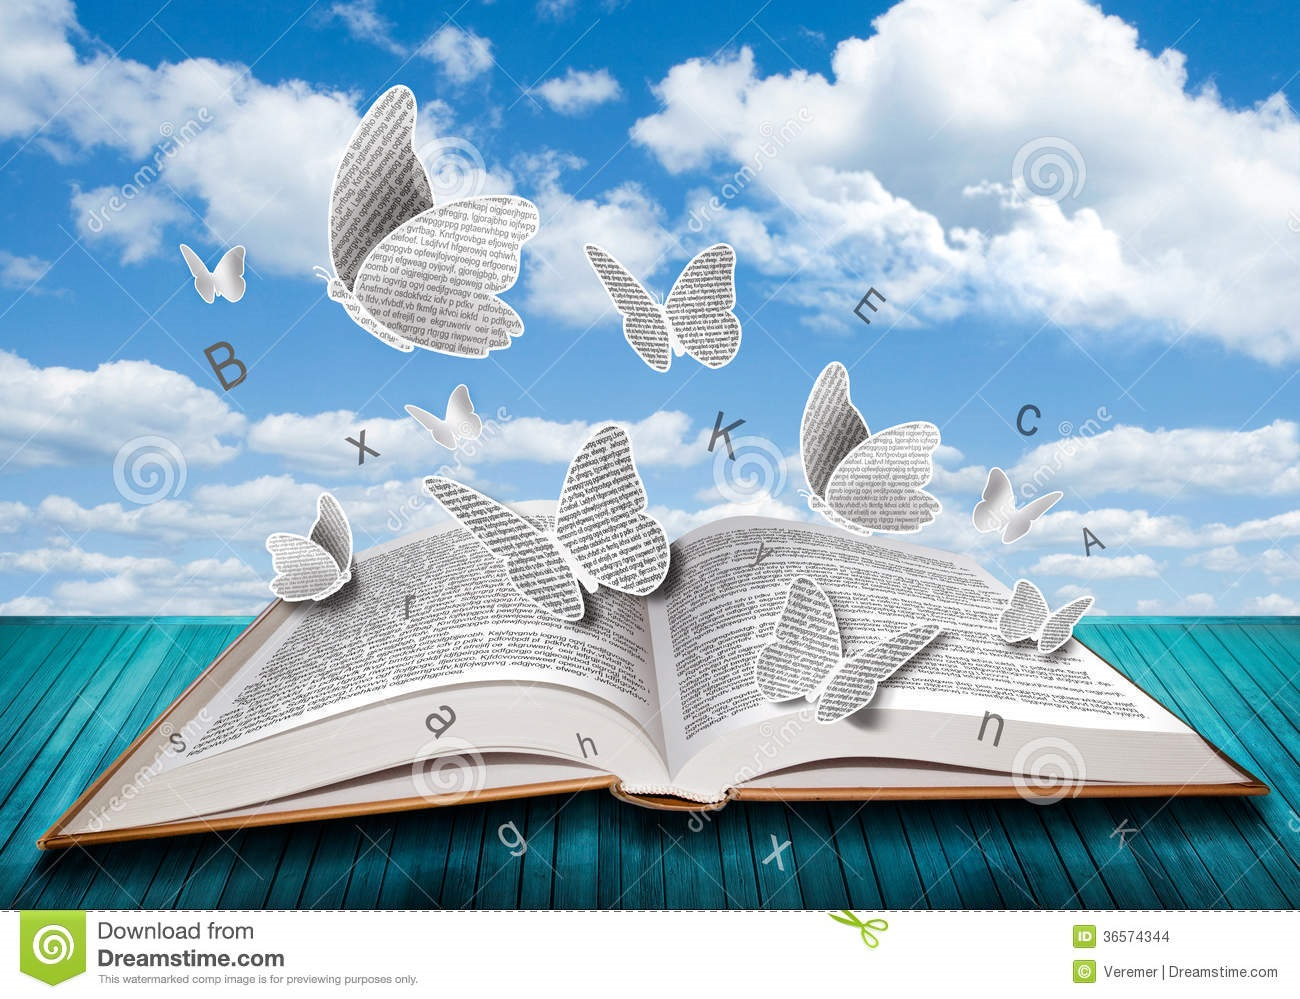 Compra libros de Anna Rossell